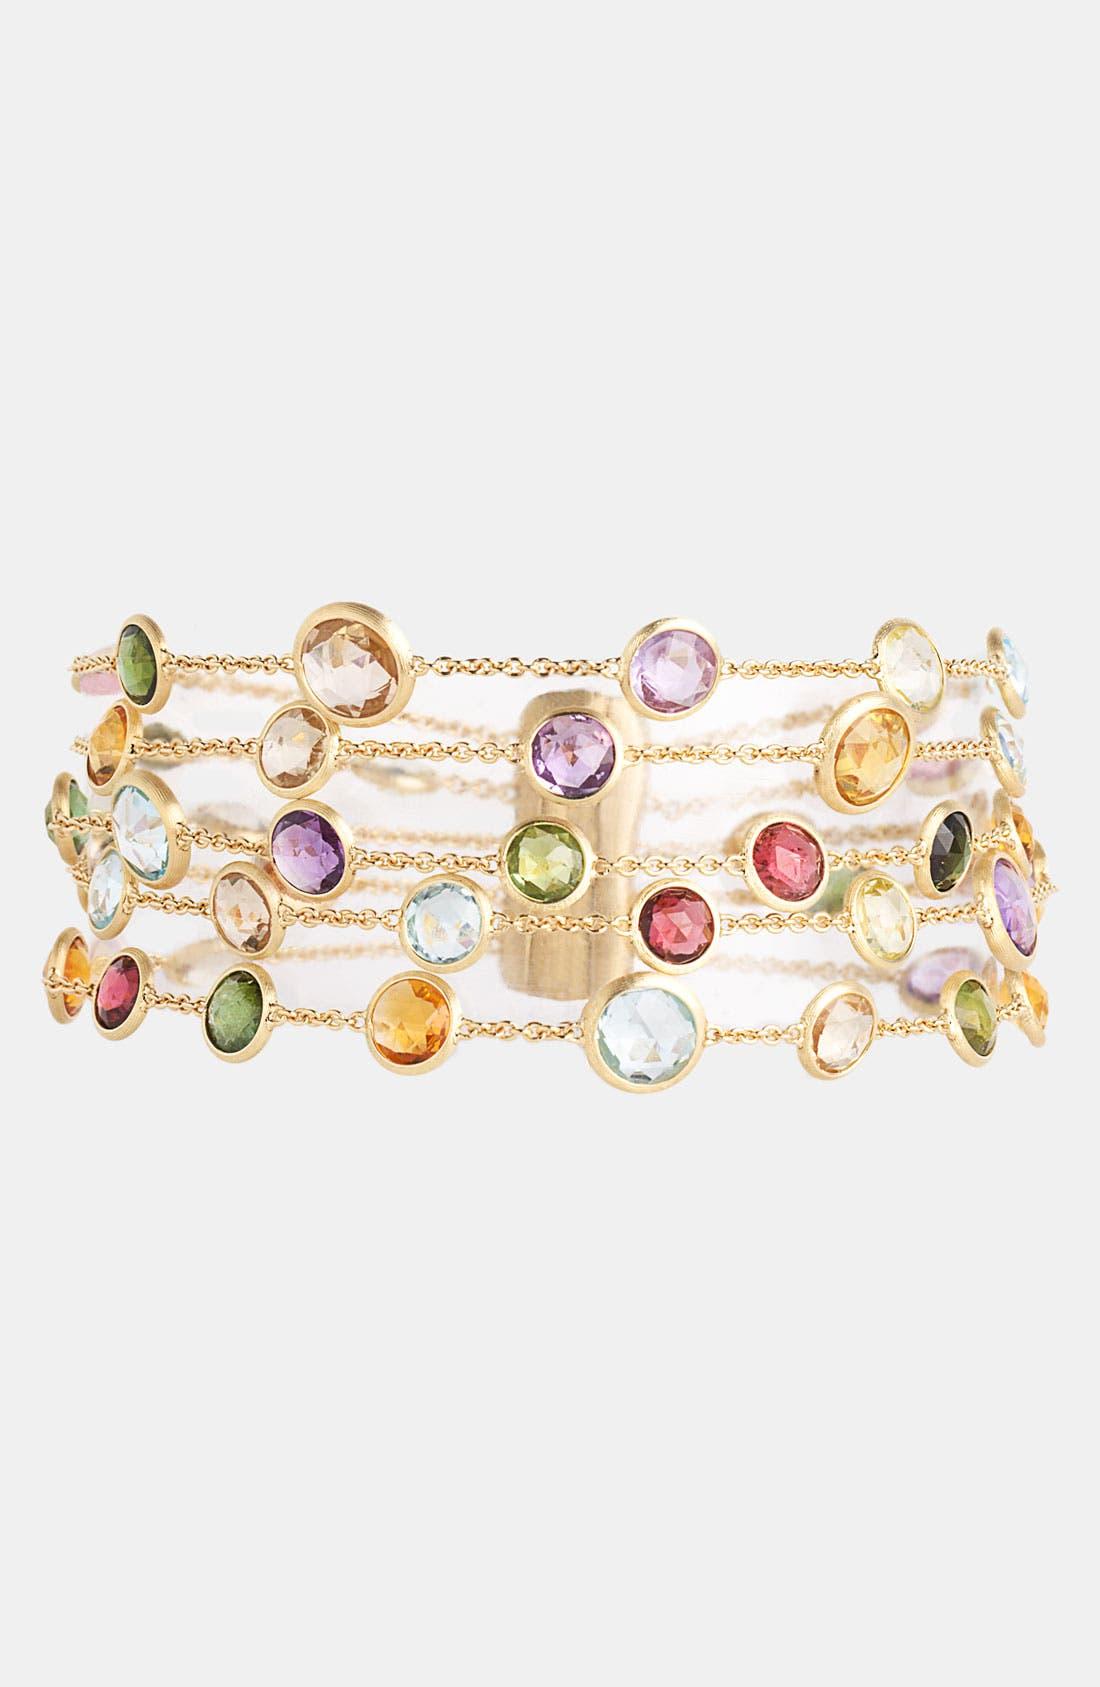 Alternate Image 1 Selected - Marco Bicego 'Mini Jaipur' 5-Strand Bracelet